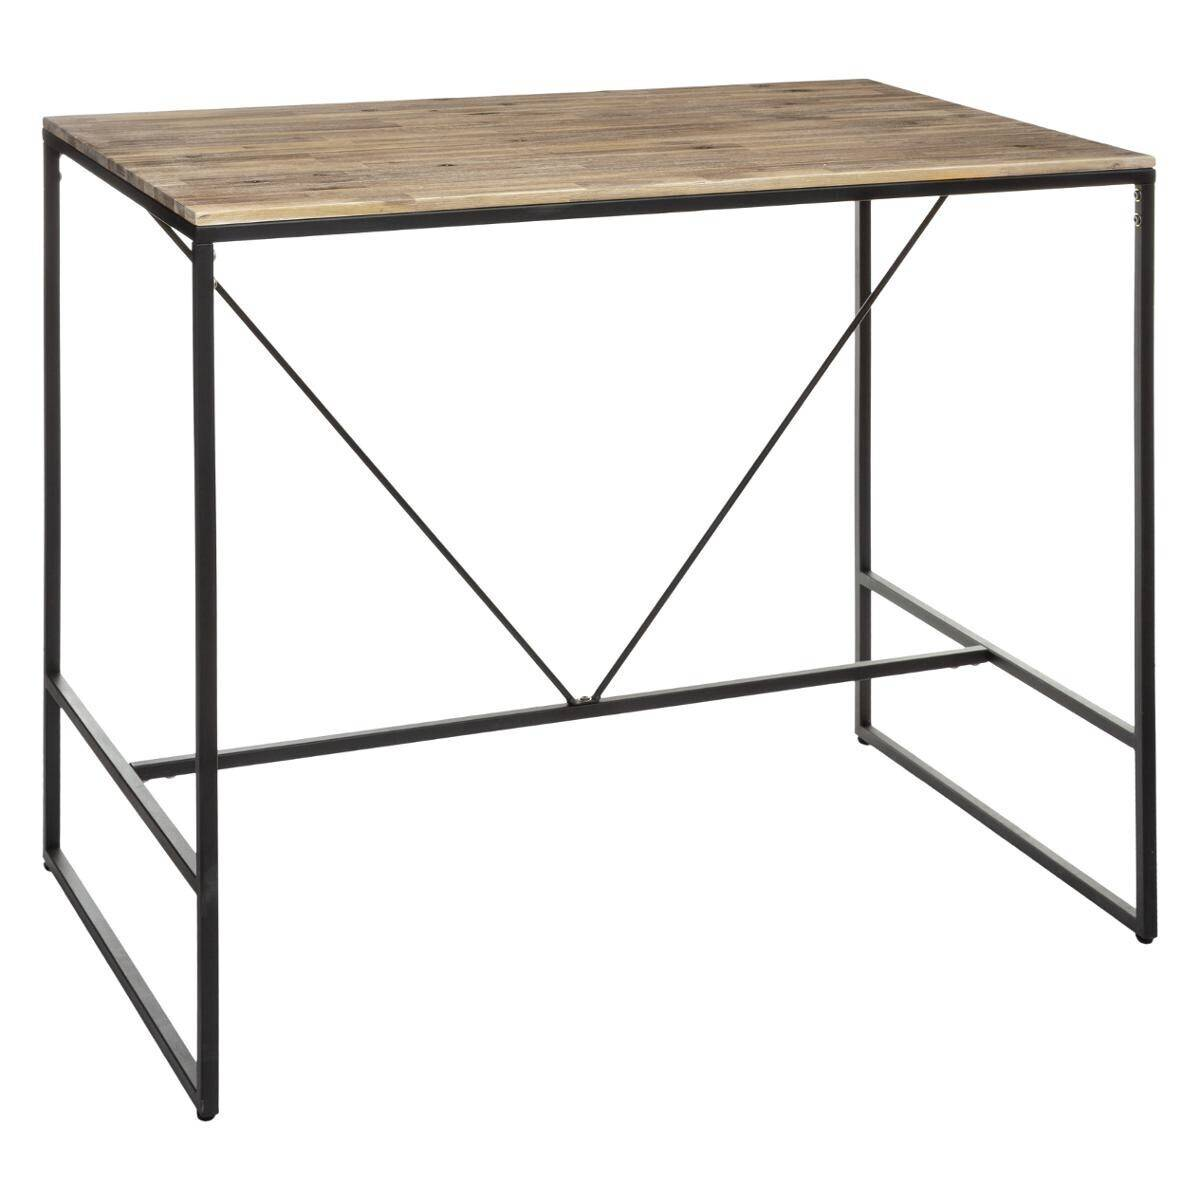 "Atmosphera Table à manger Bar ""Edena"" en bois d'acacia"